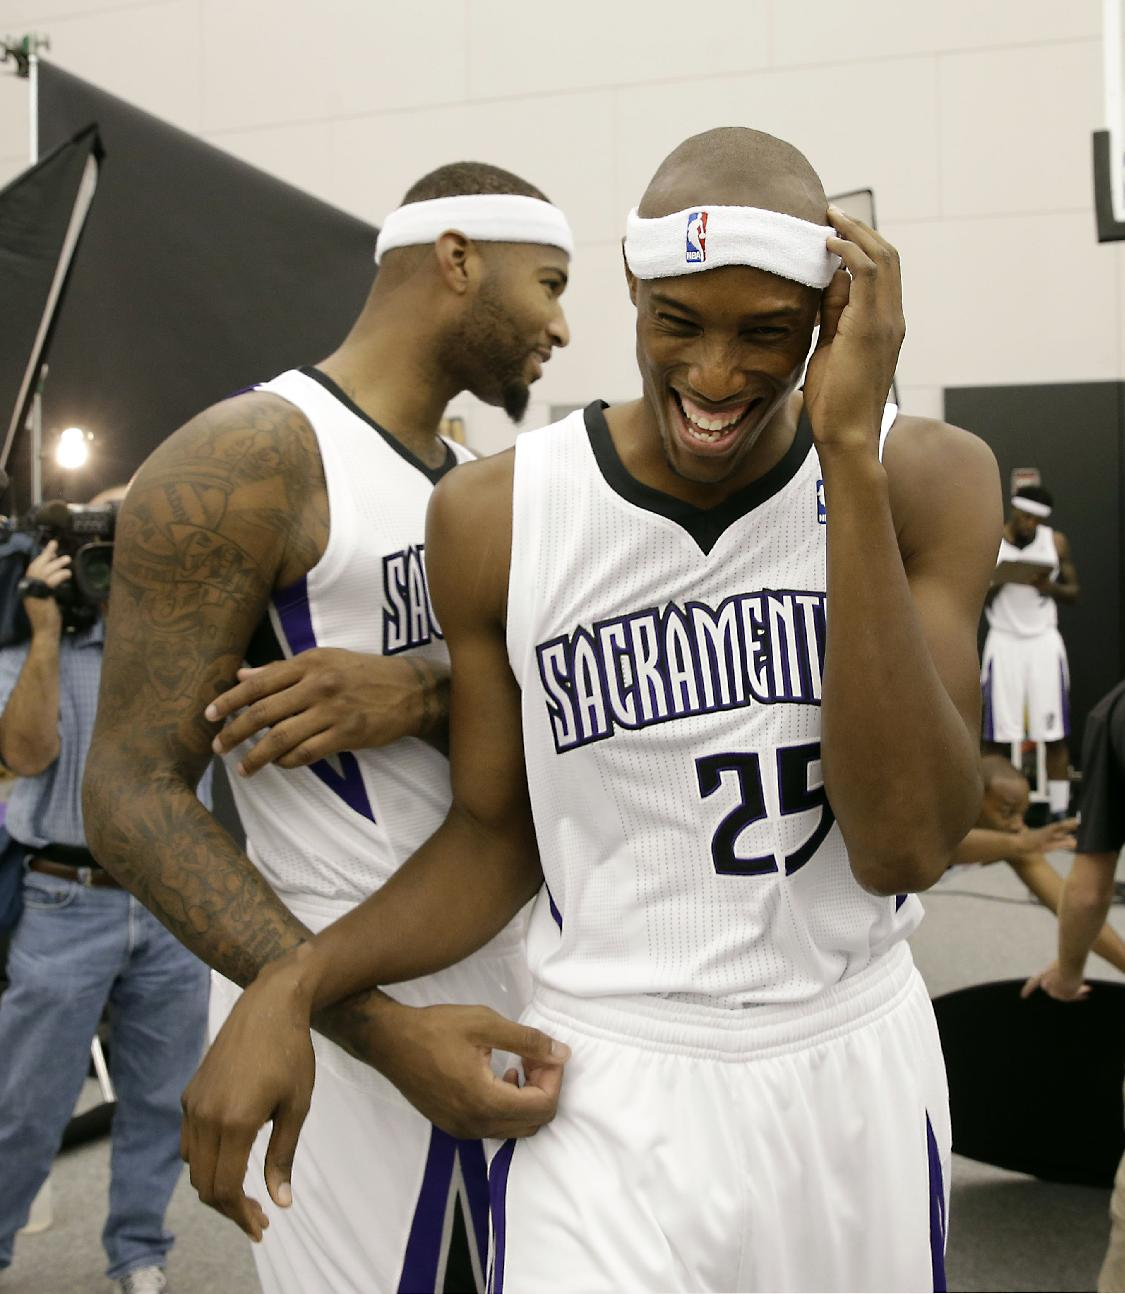 Sacramento Kings center DeMarcus Cousins, left, jokes with teammate Travis Outlaw during the team's NBA basketball media day in Sacramento, Calif., Monday, Sept. 30, 2013